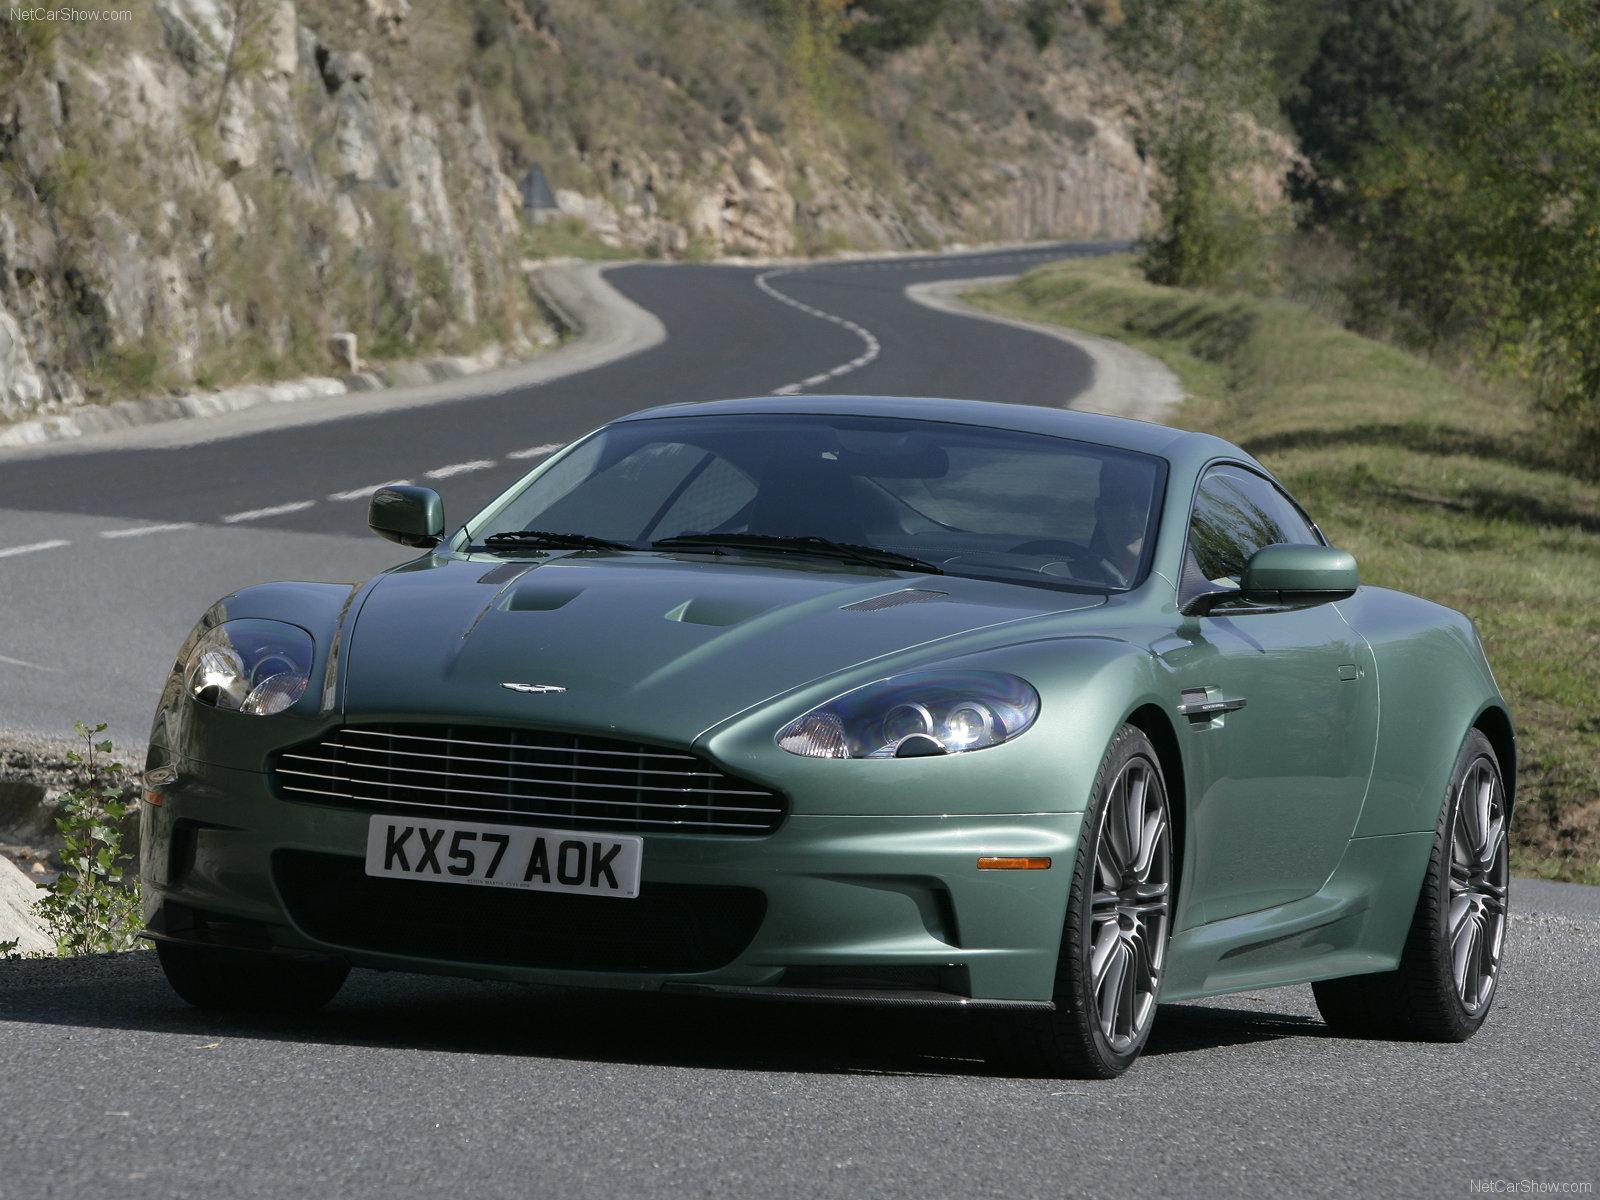 Aston Martin Dbs Racing Green Photos Photogallery With